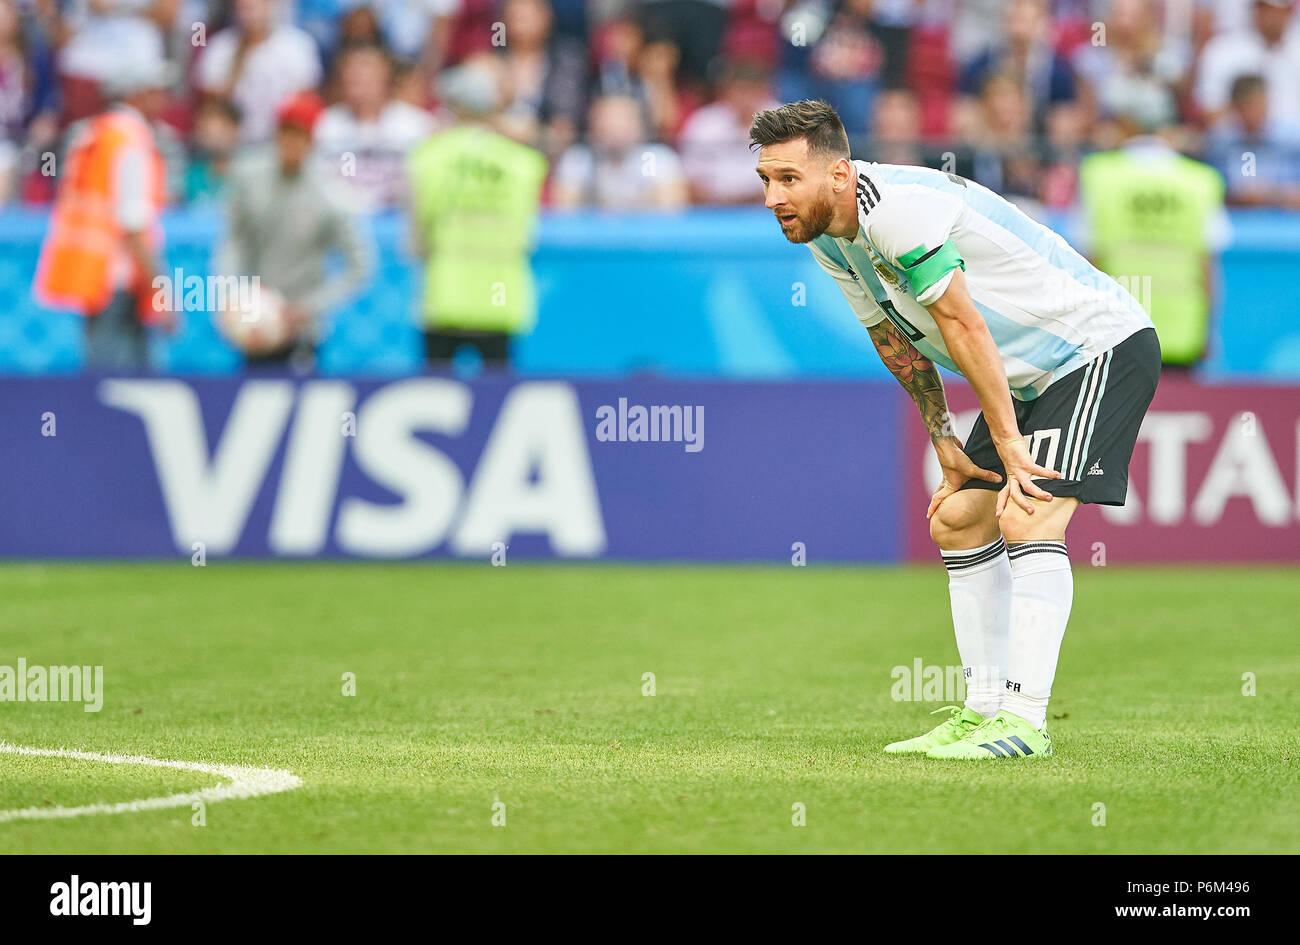 Kazan, Russie. Jun 30, 2018. Argentine France 3 4, Soccer